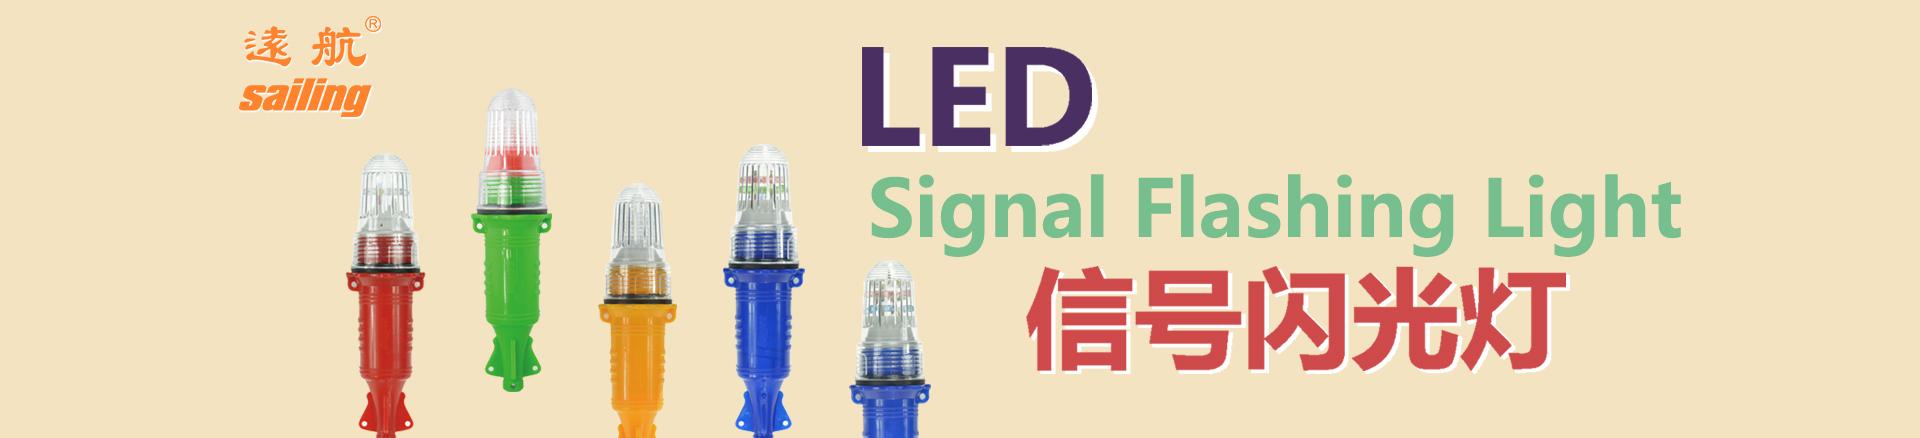 LED信号闪光灯